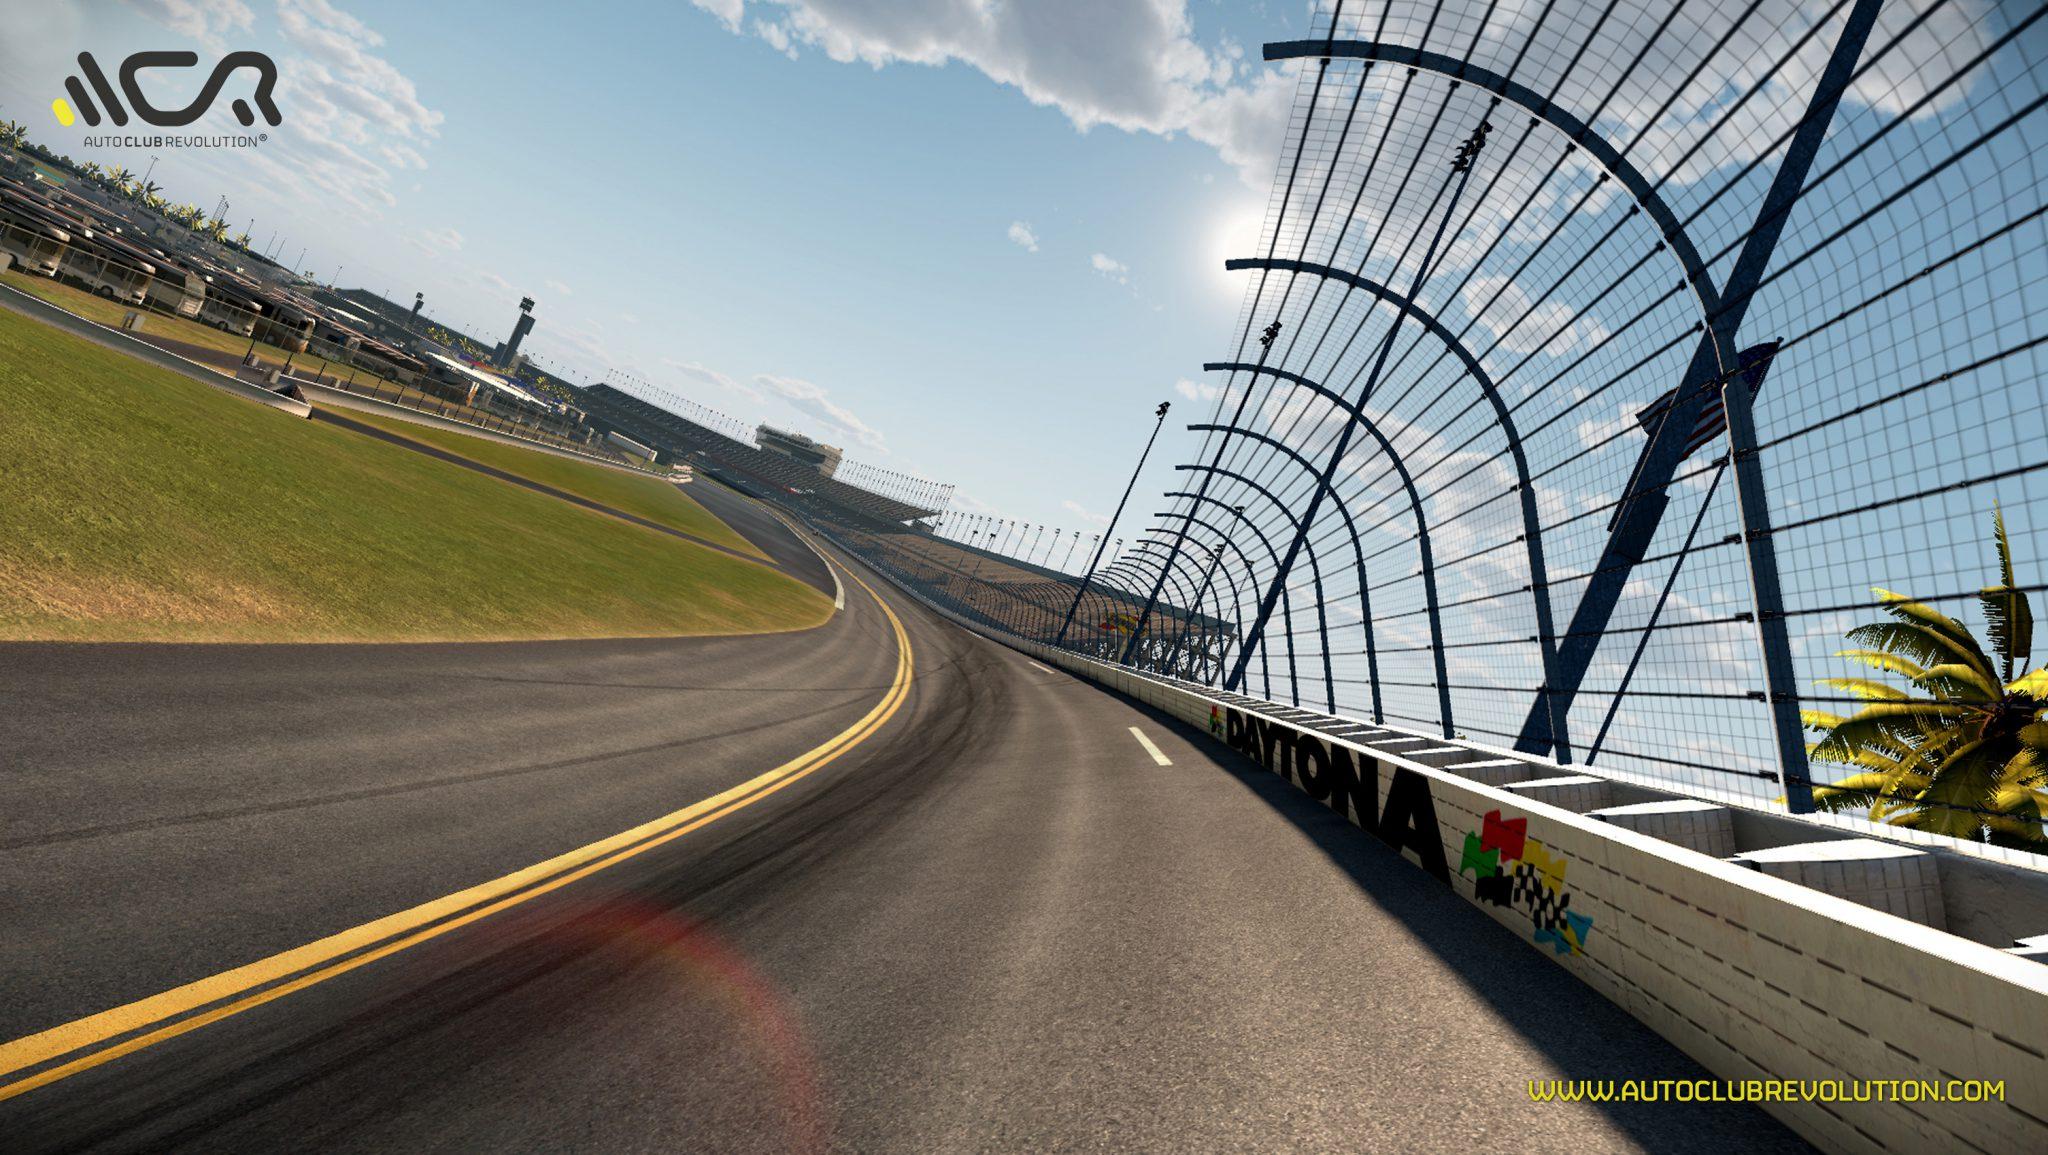 World Famous Car Wallpaper Daytona Intl Speedway Added To Auto Club Revolution